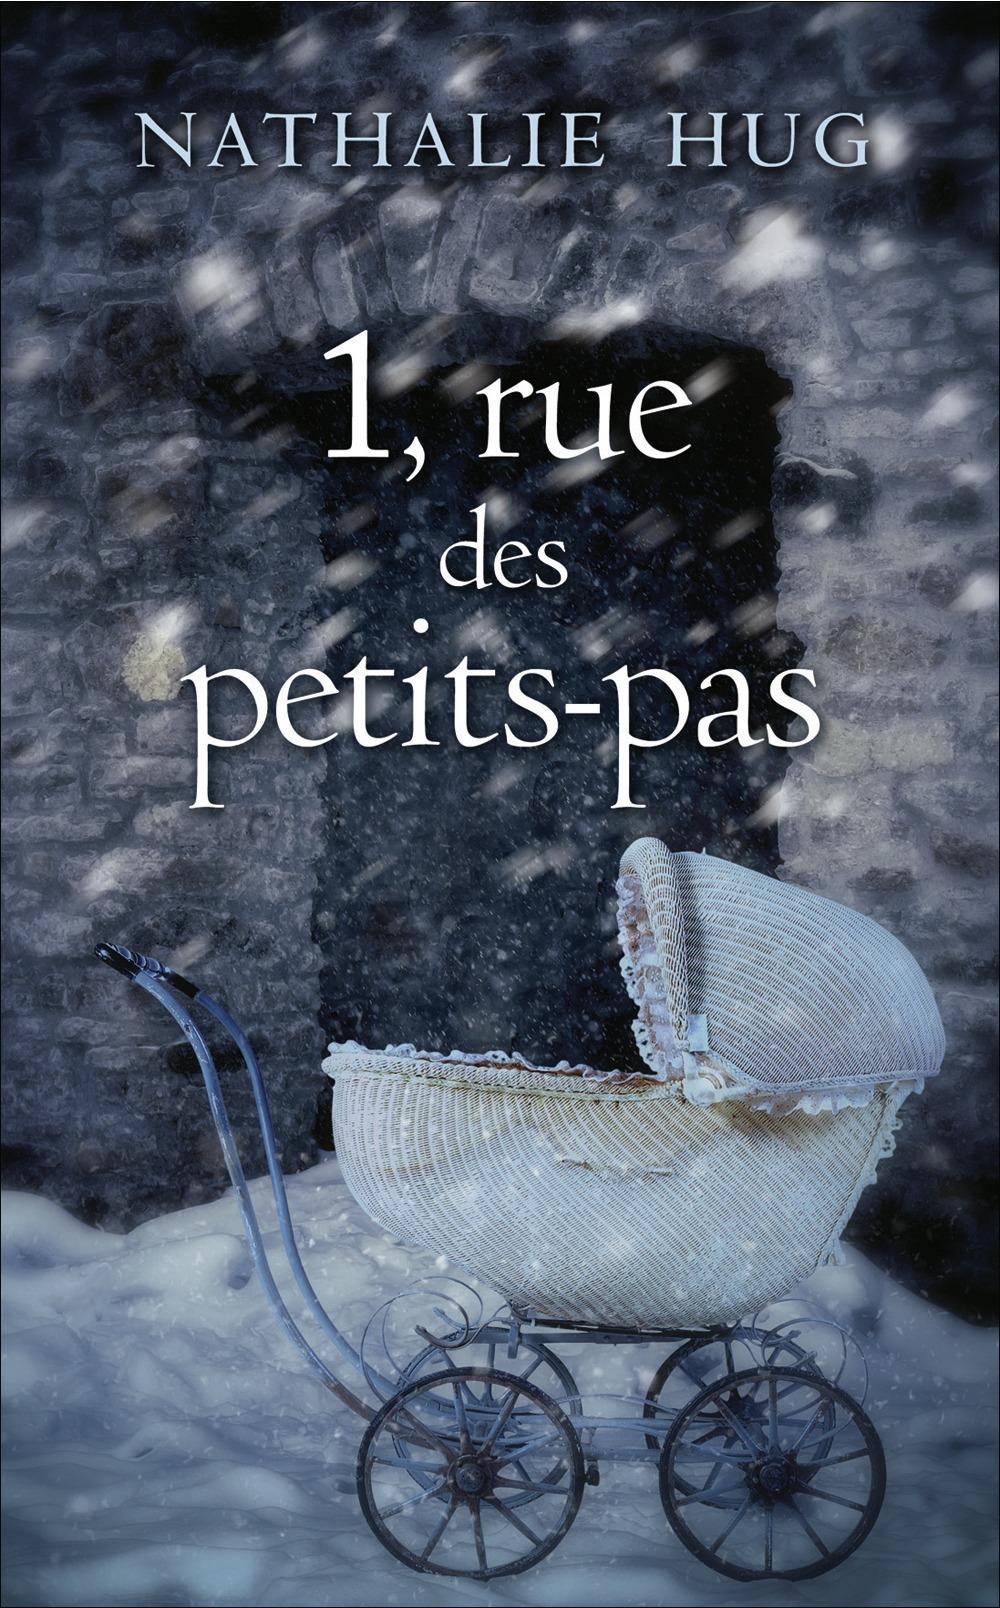 HUG Nathalie 1-rue-des-petits-pas-593847